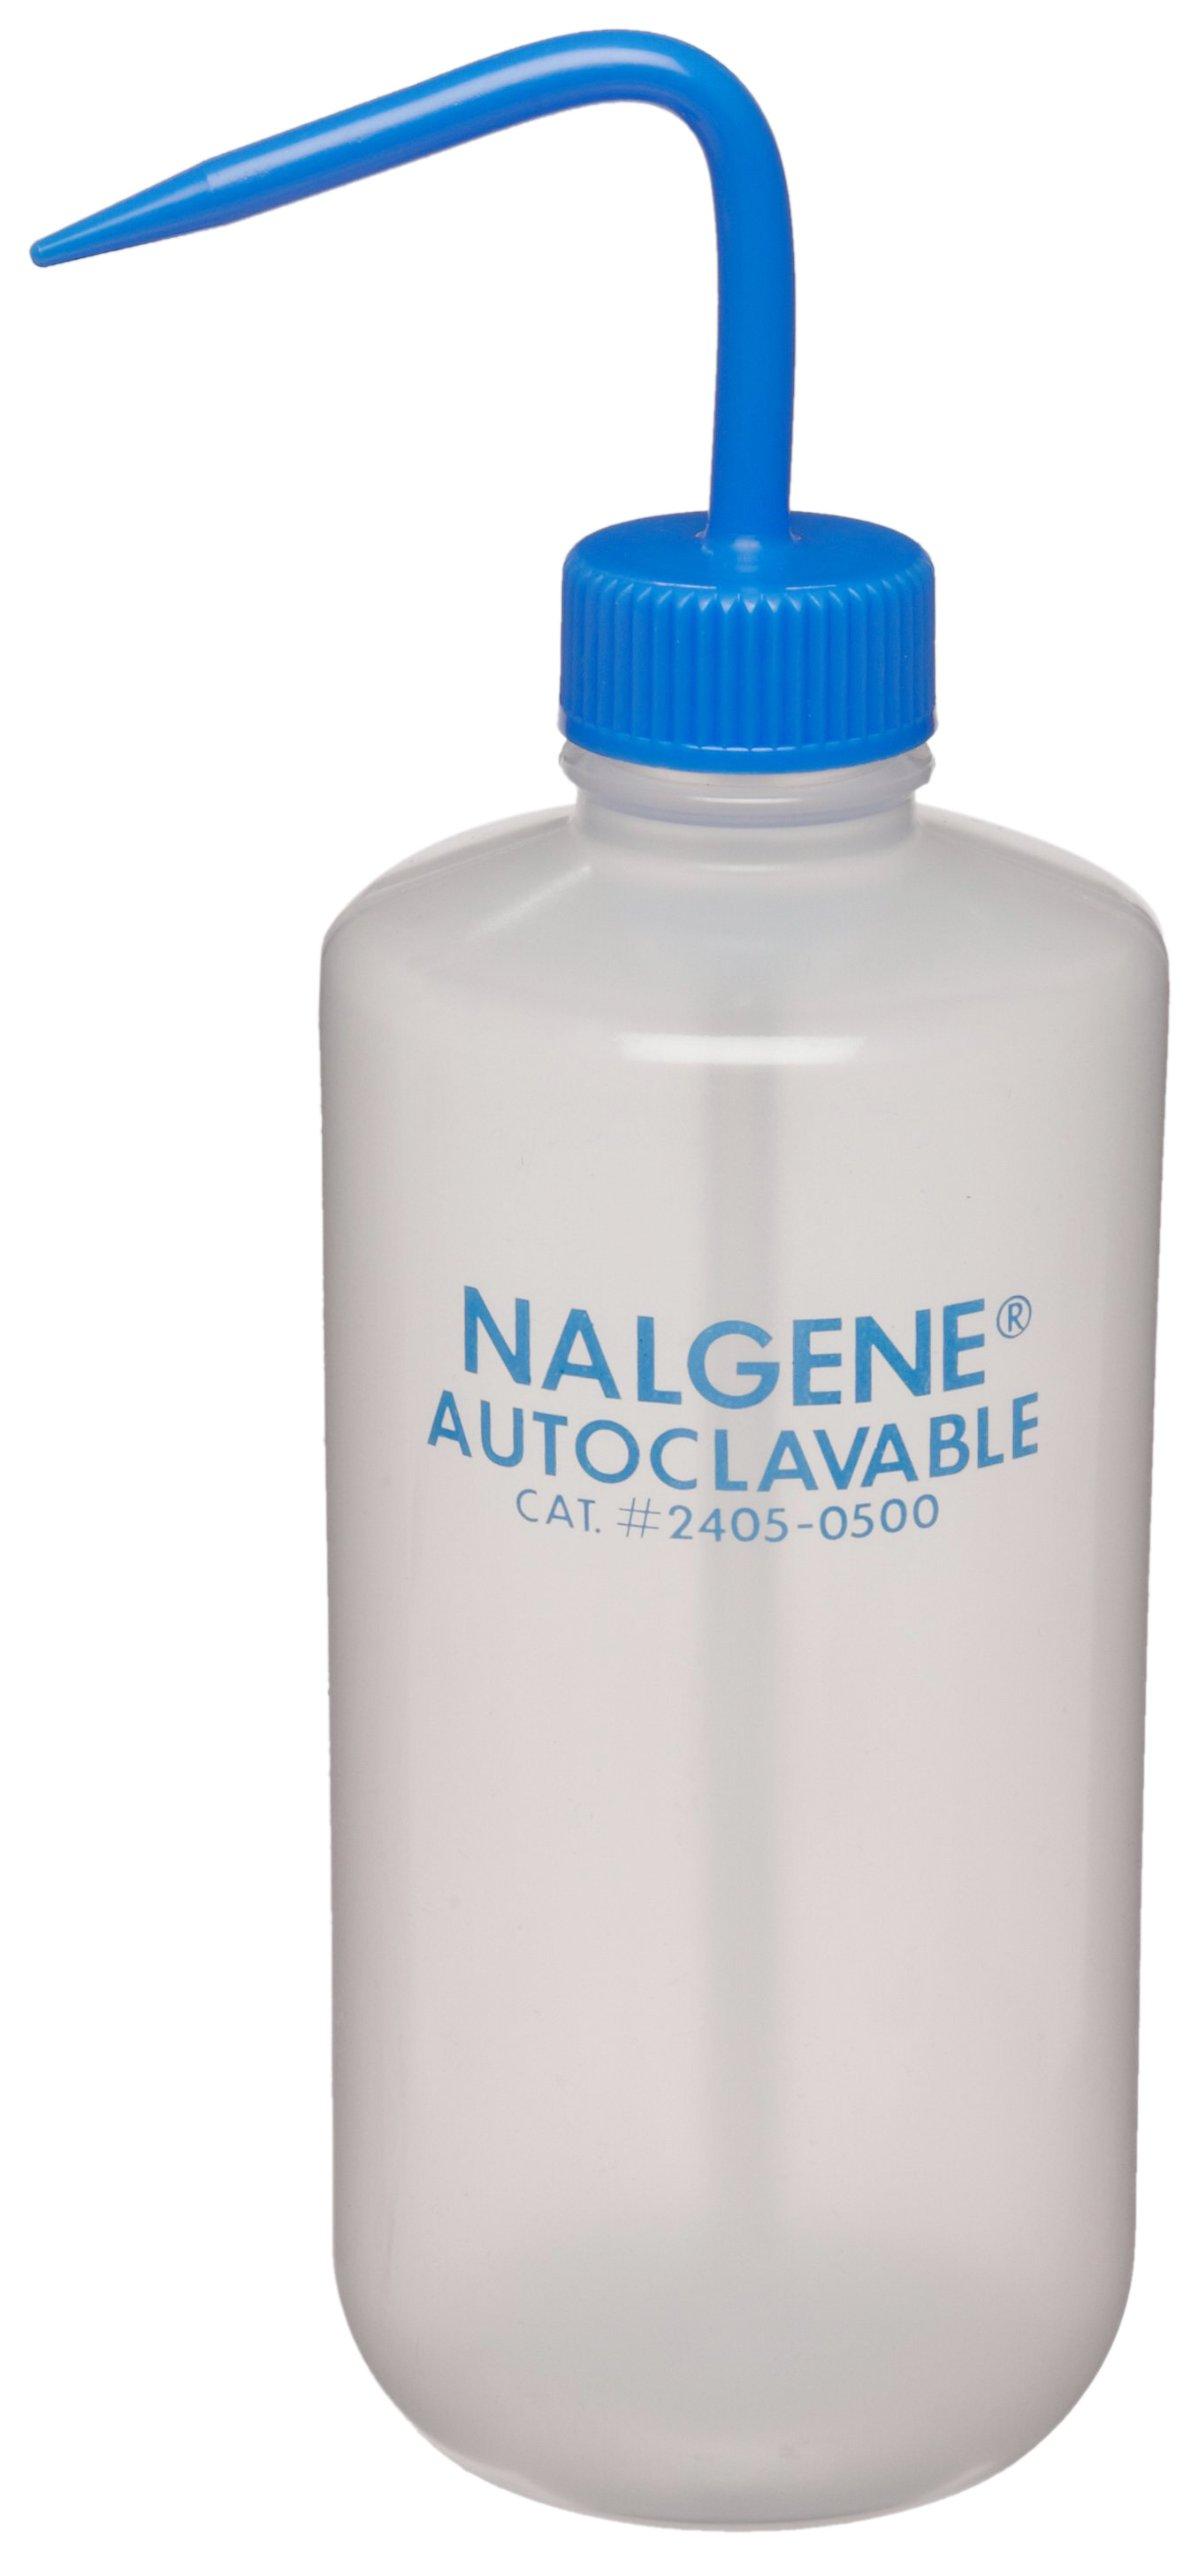 Nalgene 2405-0500 Wash Bottle, Autoclavable, Polypropylene (PP), 500mL (Pack of 6) by Nalgene